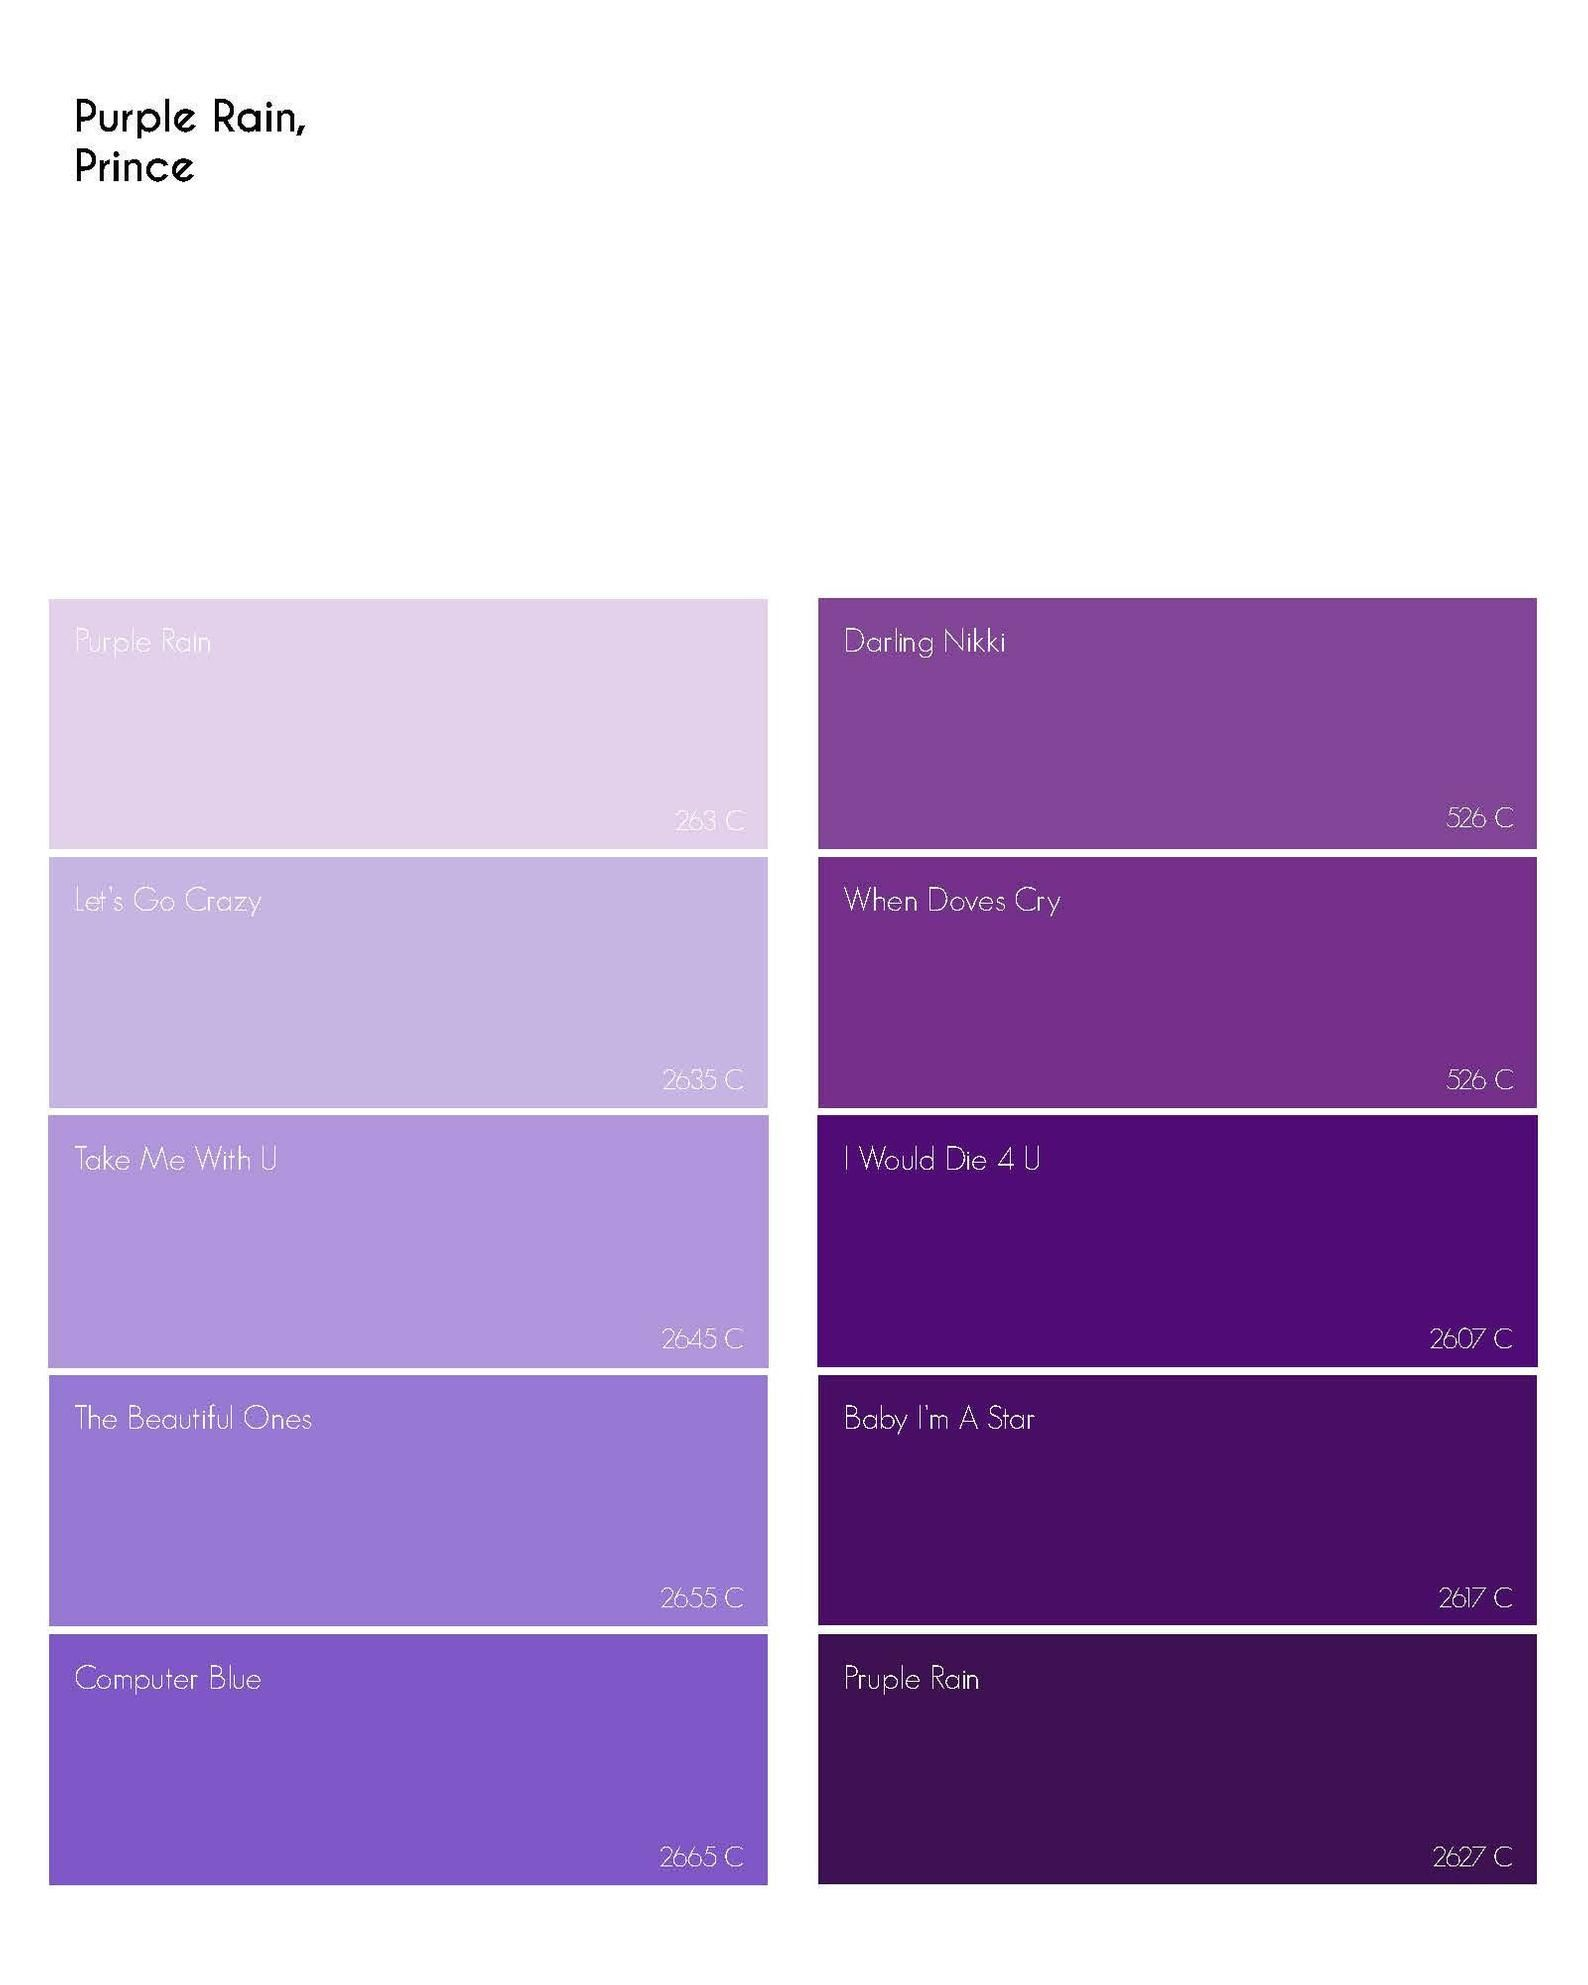 pantone palette print purple rain by prince etsy 2020 273c 7590